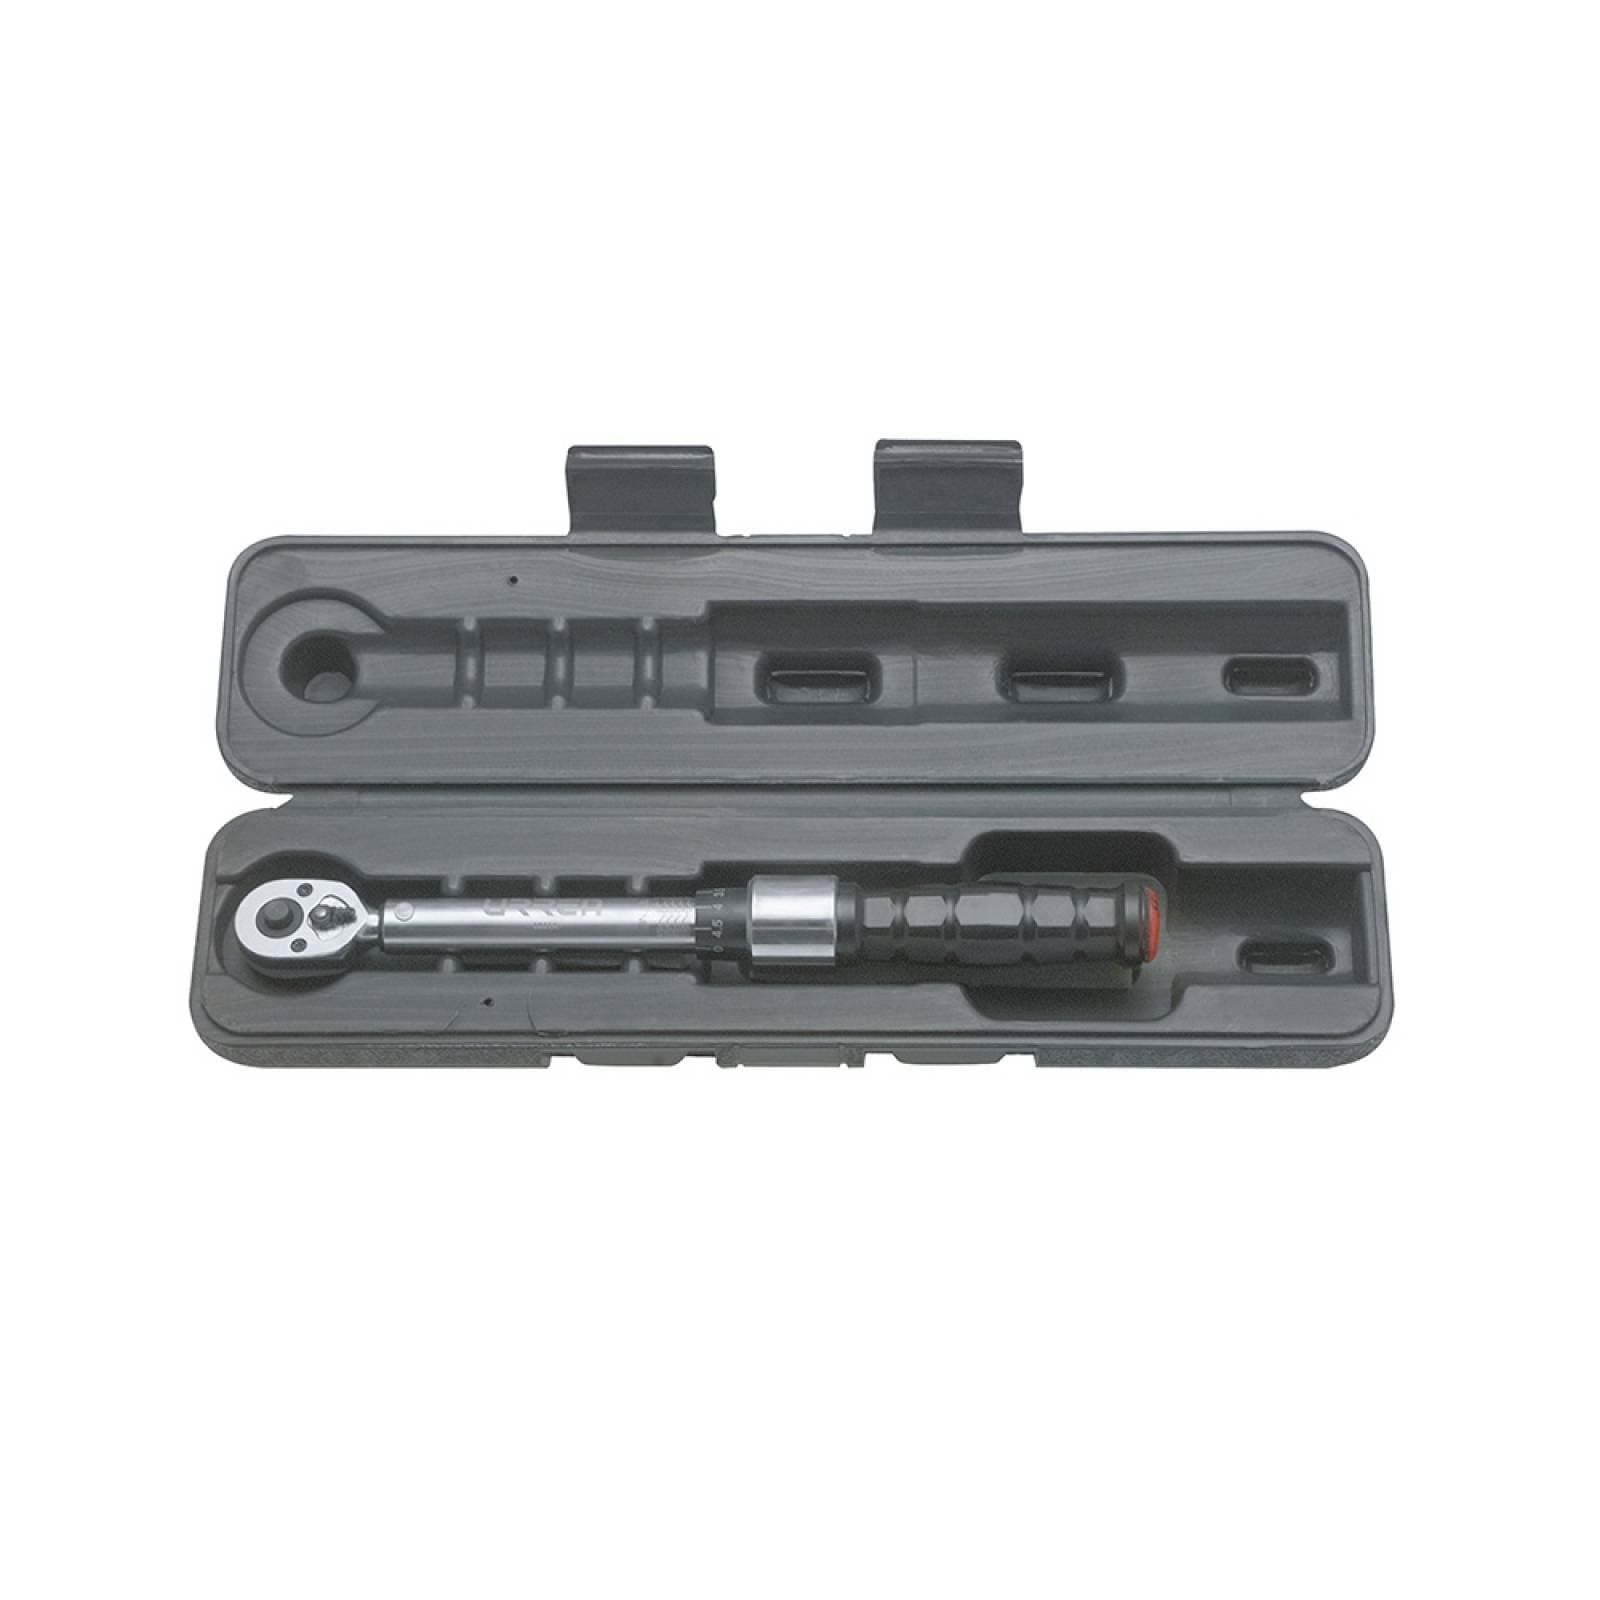 "Torquímetro de trueno dual 1/4"" 10-50in-lb 6061A Urrea"